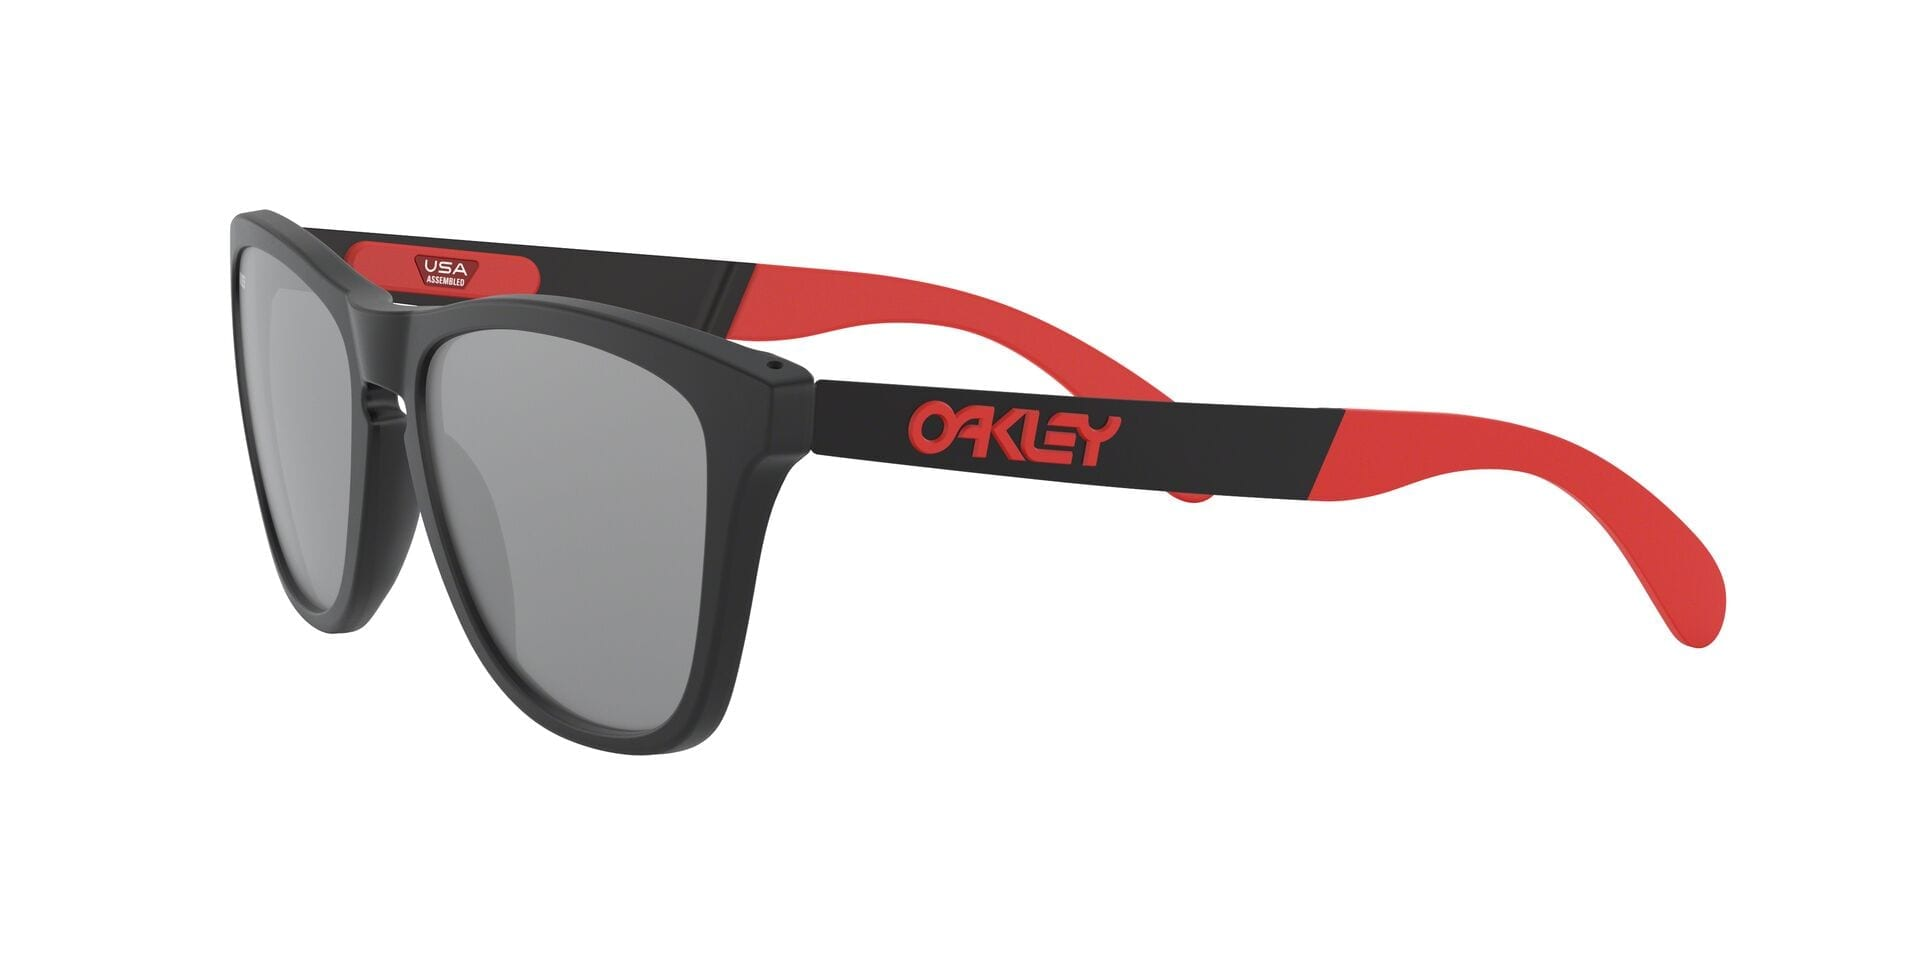 544a02aafb9ac Z87 Oakley Prescription